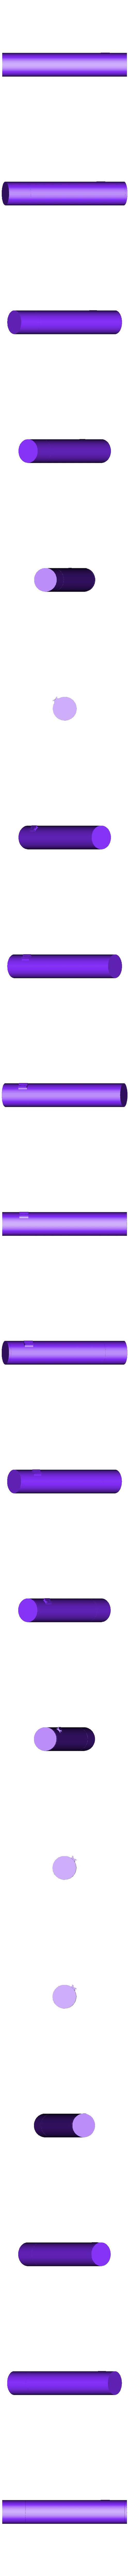 Aim9x part 2.stl Download STL file AIM-9 Sidewinder • 3D printing design, Josefbouzgarrou